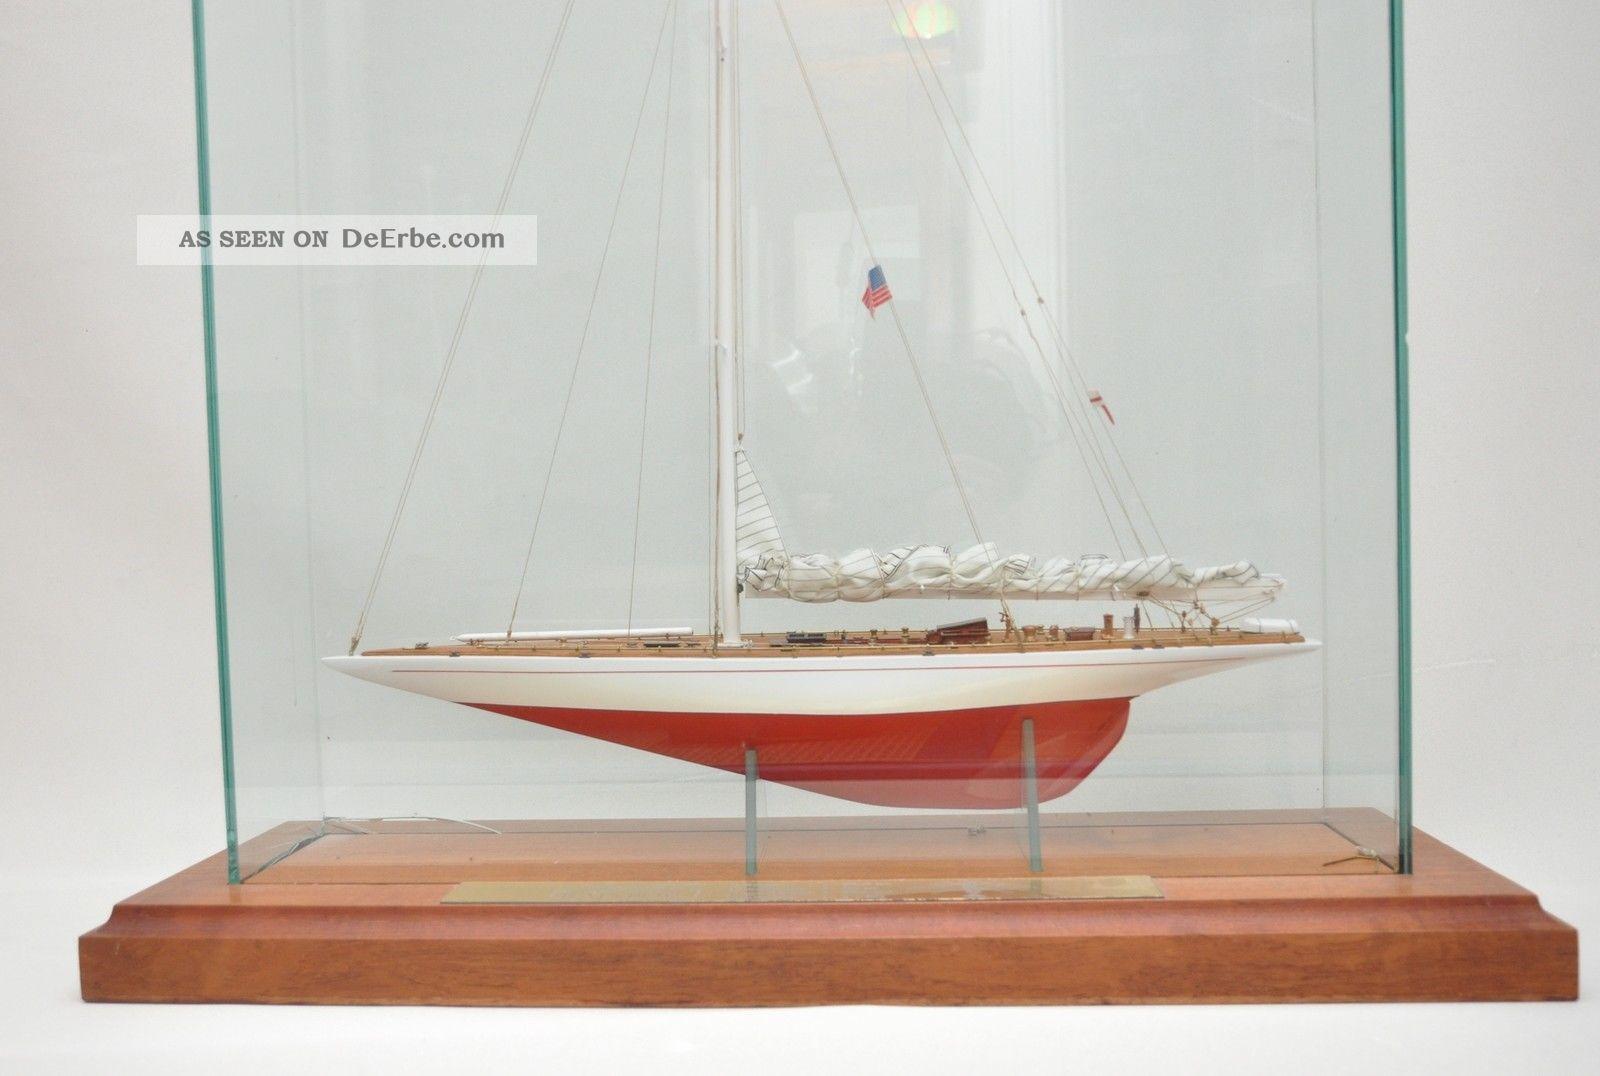 Schiffsmodell rainbow america 39 s cup mit vitrine dekoration maritim nautica - Dekoration maritim ...